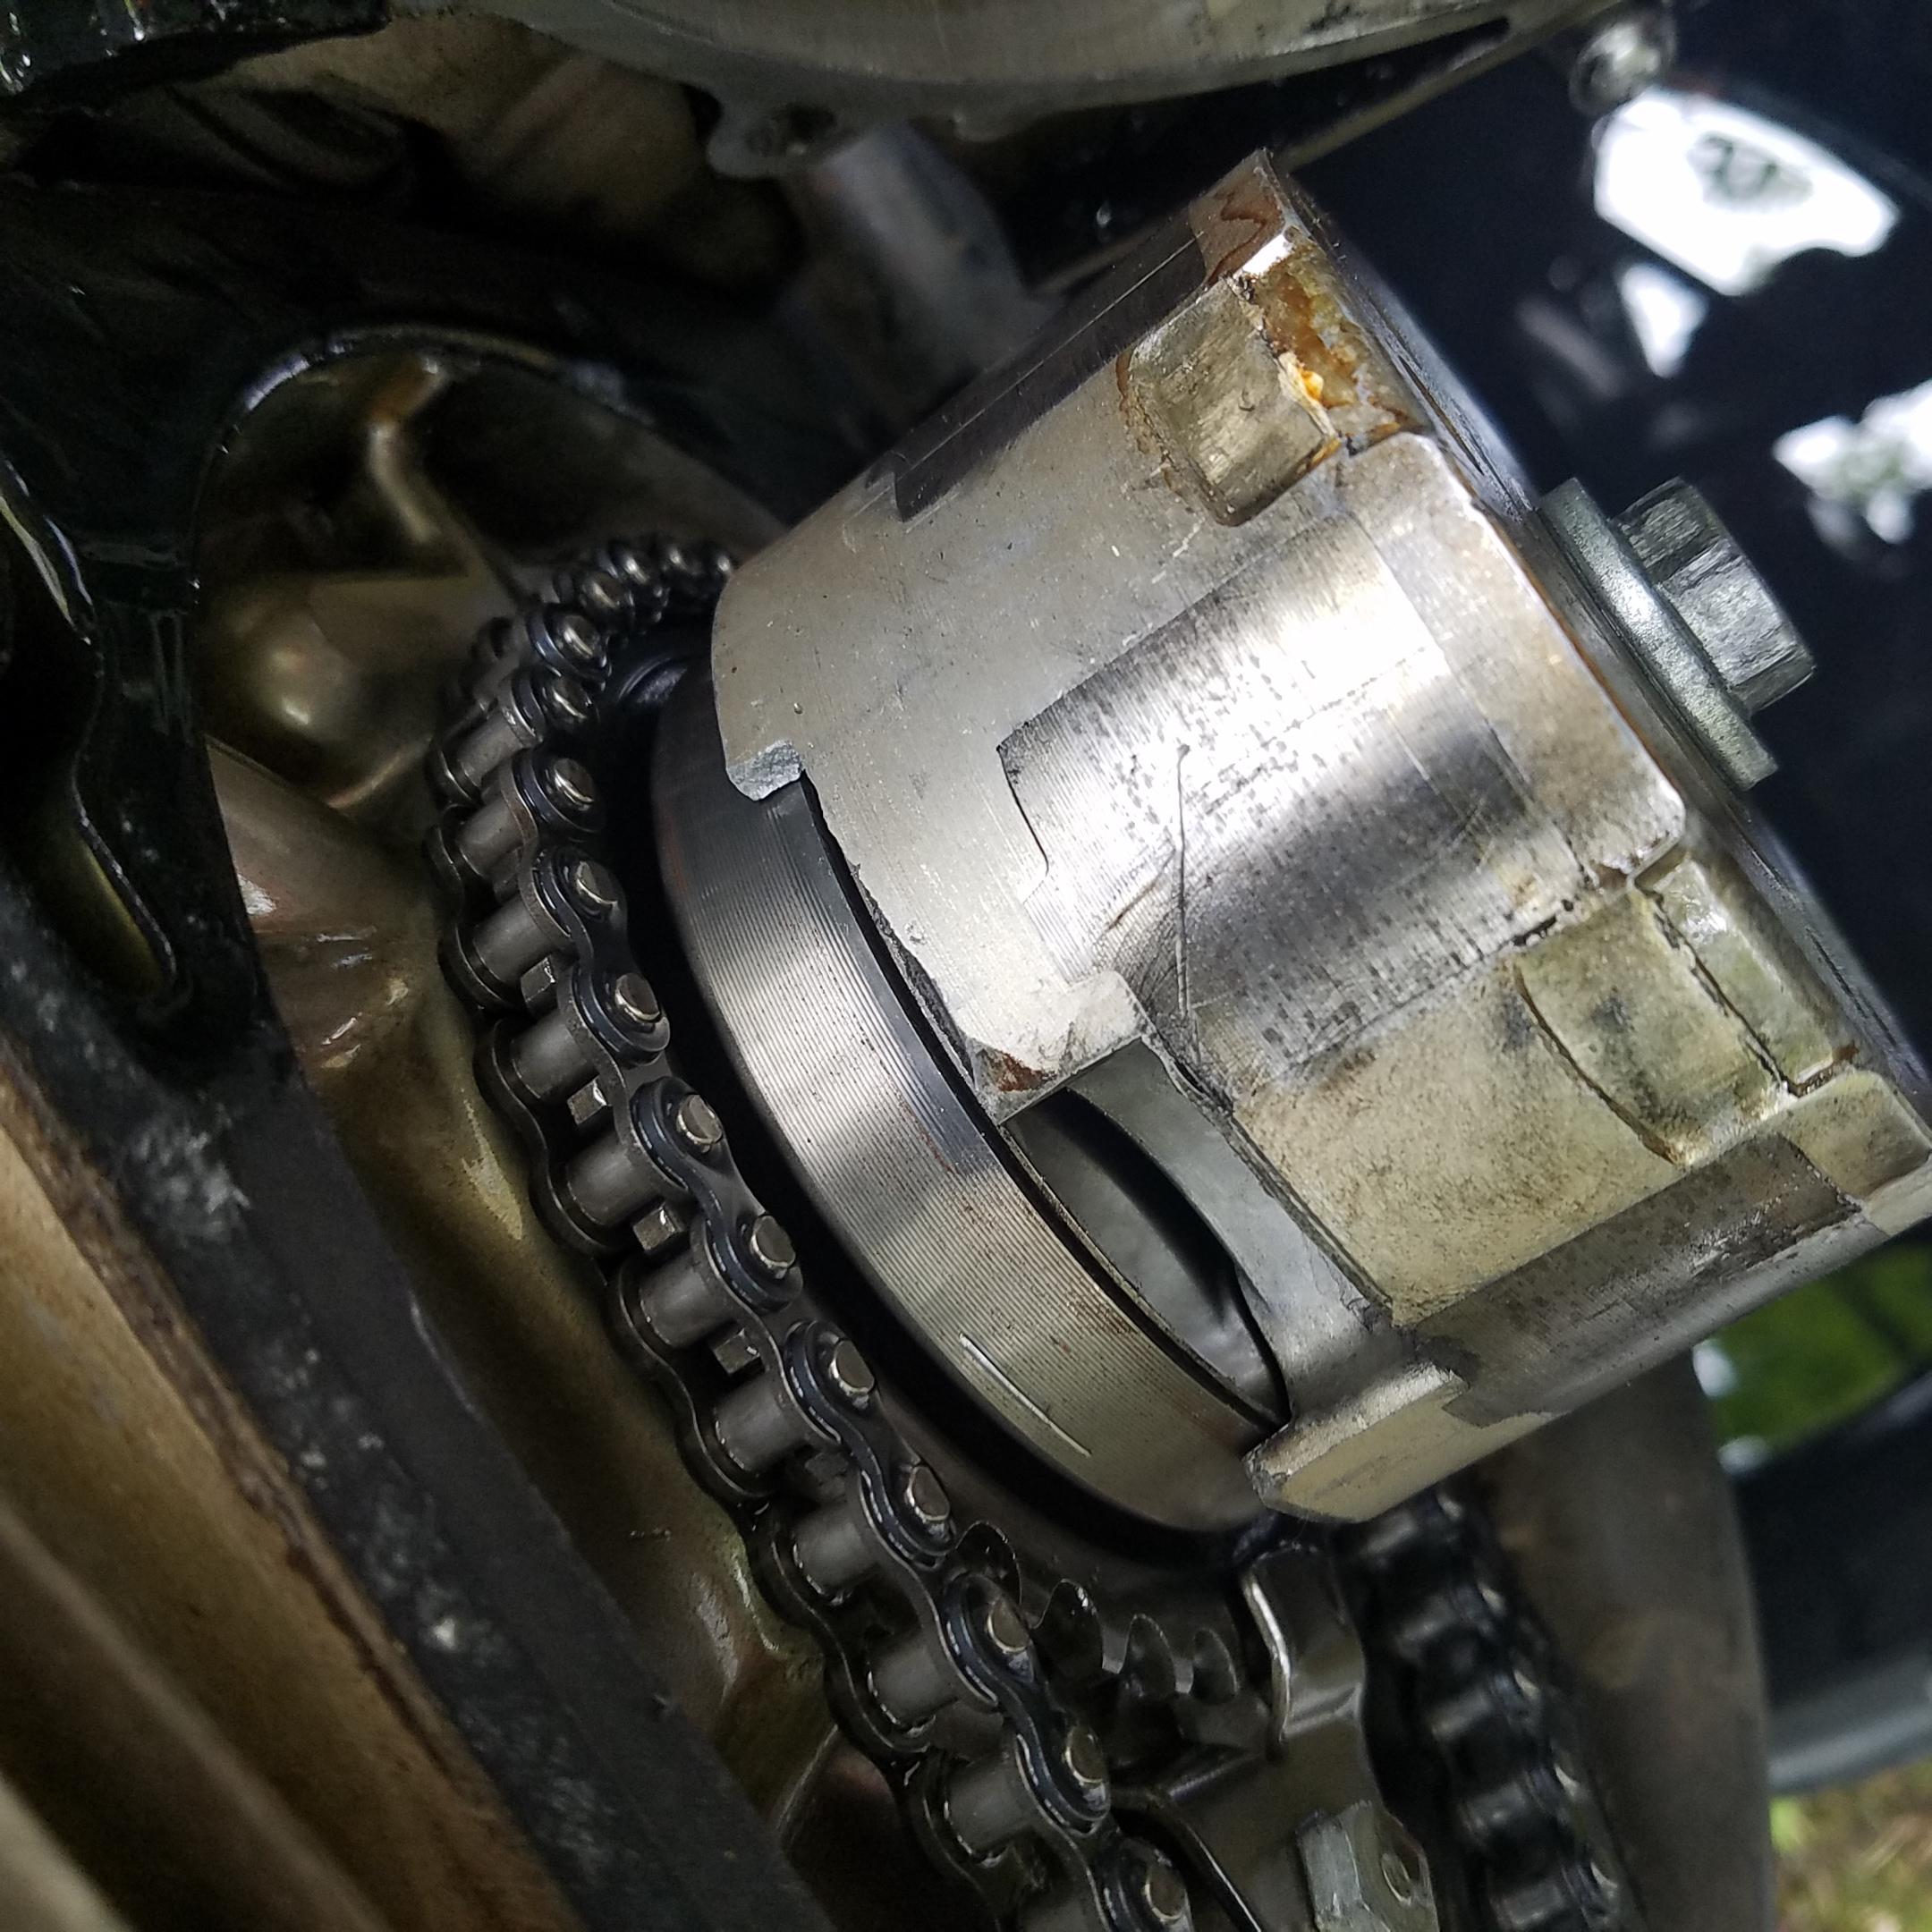 Piece of Aluminum found in old oil-20190521_132808_1558460439491.jpg